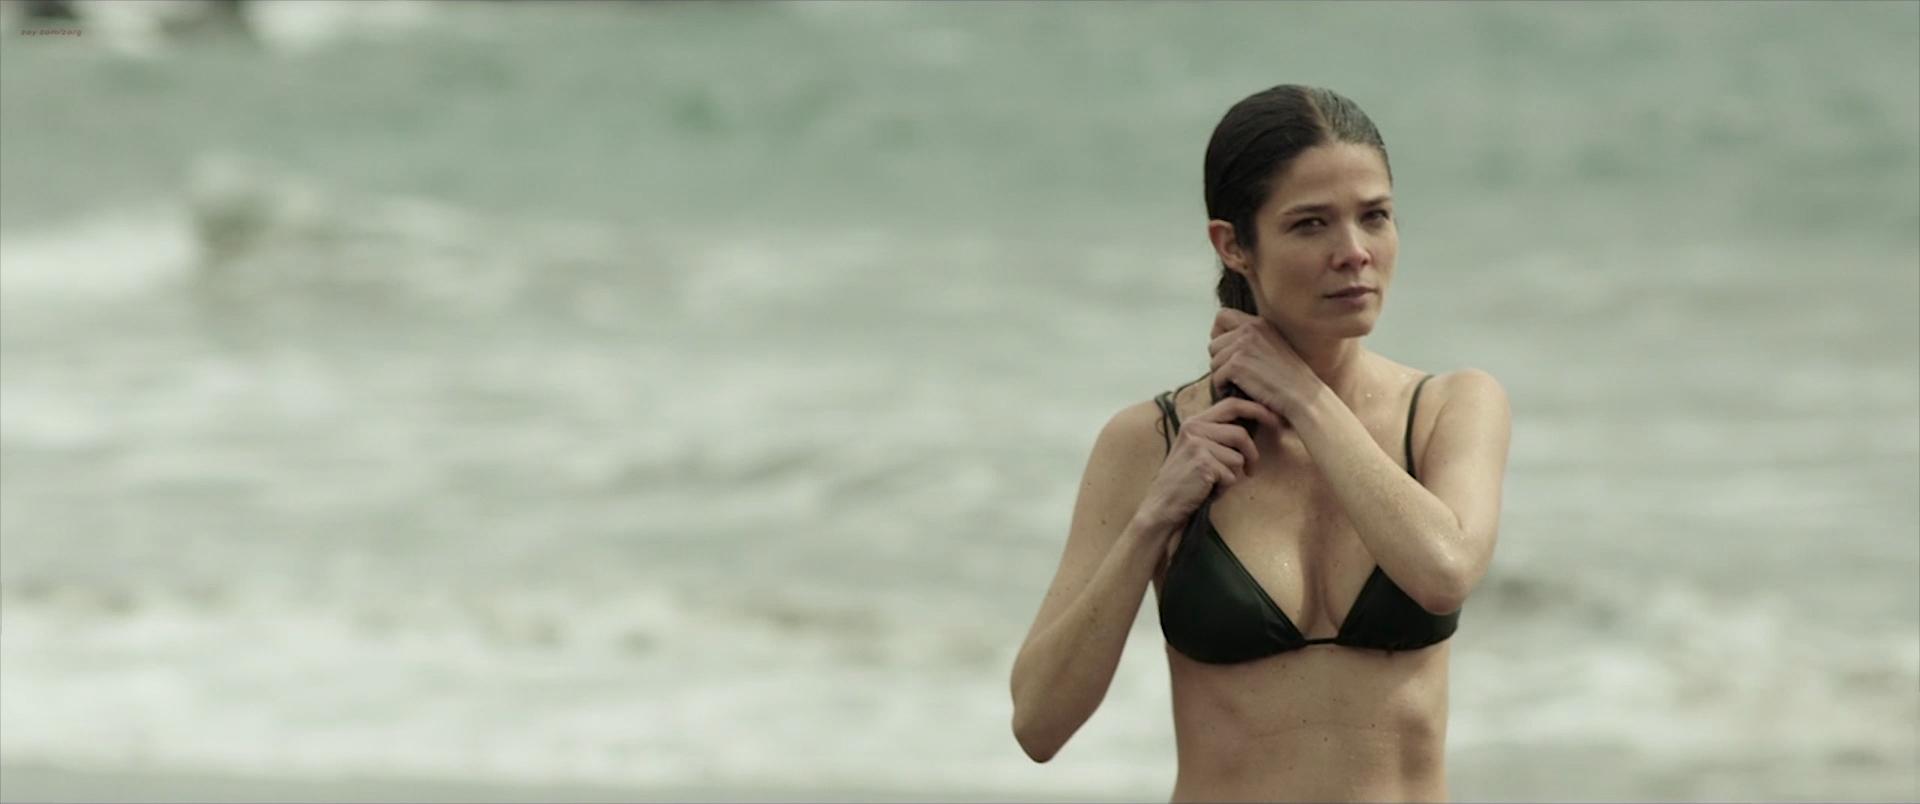 Ingrid García Jonsson nude topless and sex and Juana Acosta nude butt - Acantilado (2016) HD 1080p WebDl (4)